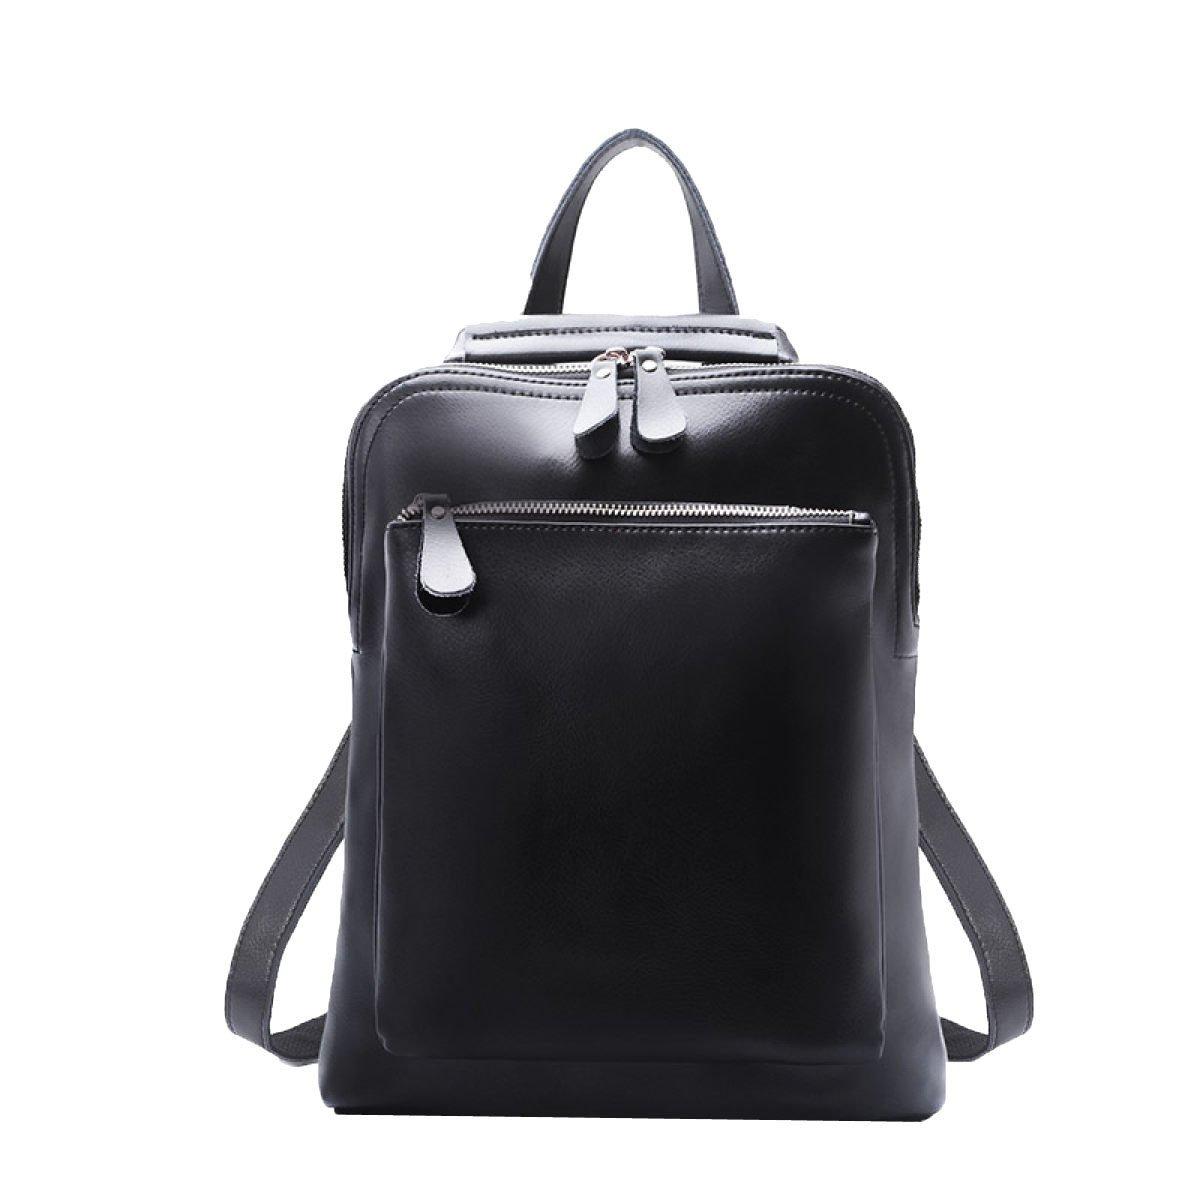 Black Medium Shoulder Bag Rucksack PU Leather Women Girls Ladies Backpack Travel Bag